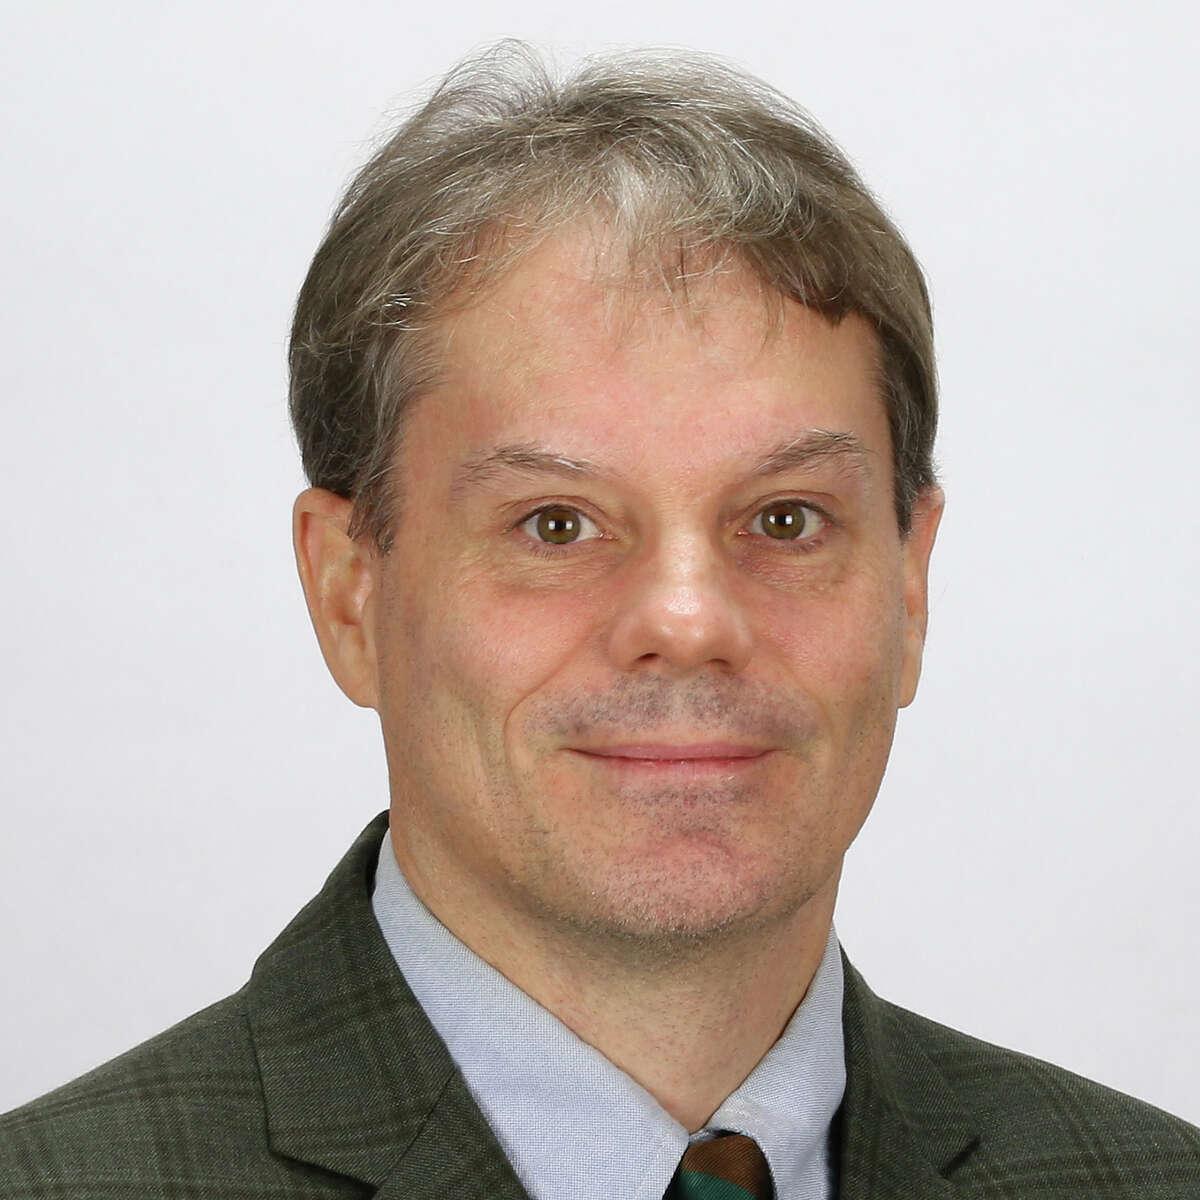 Scott Scherbyn